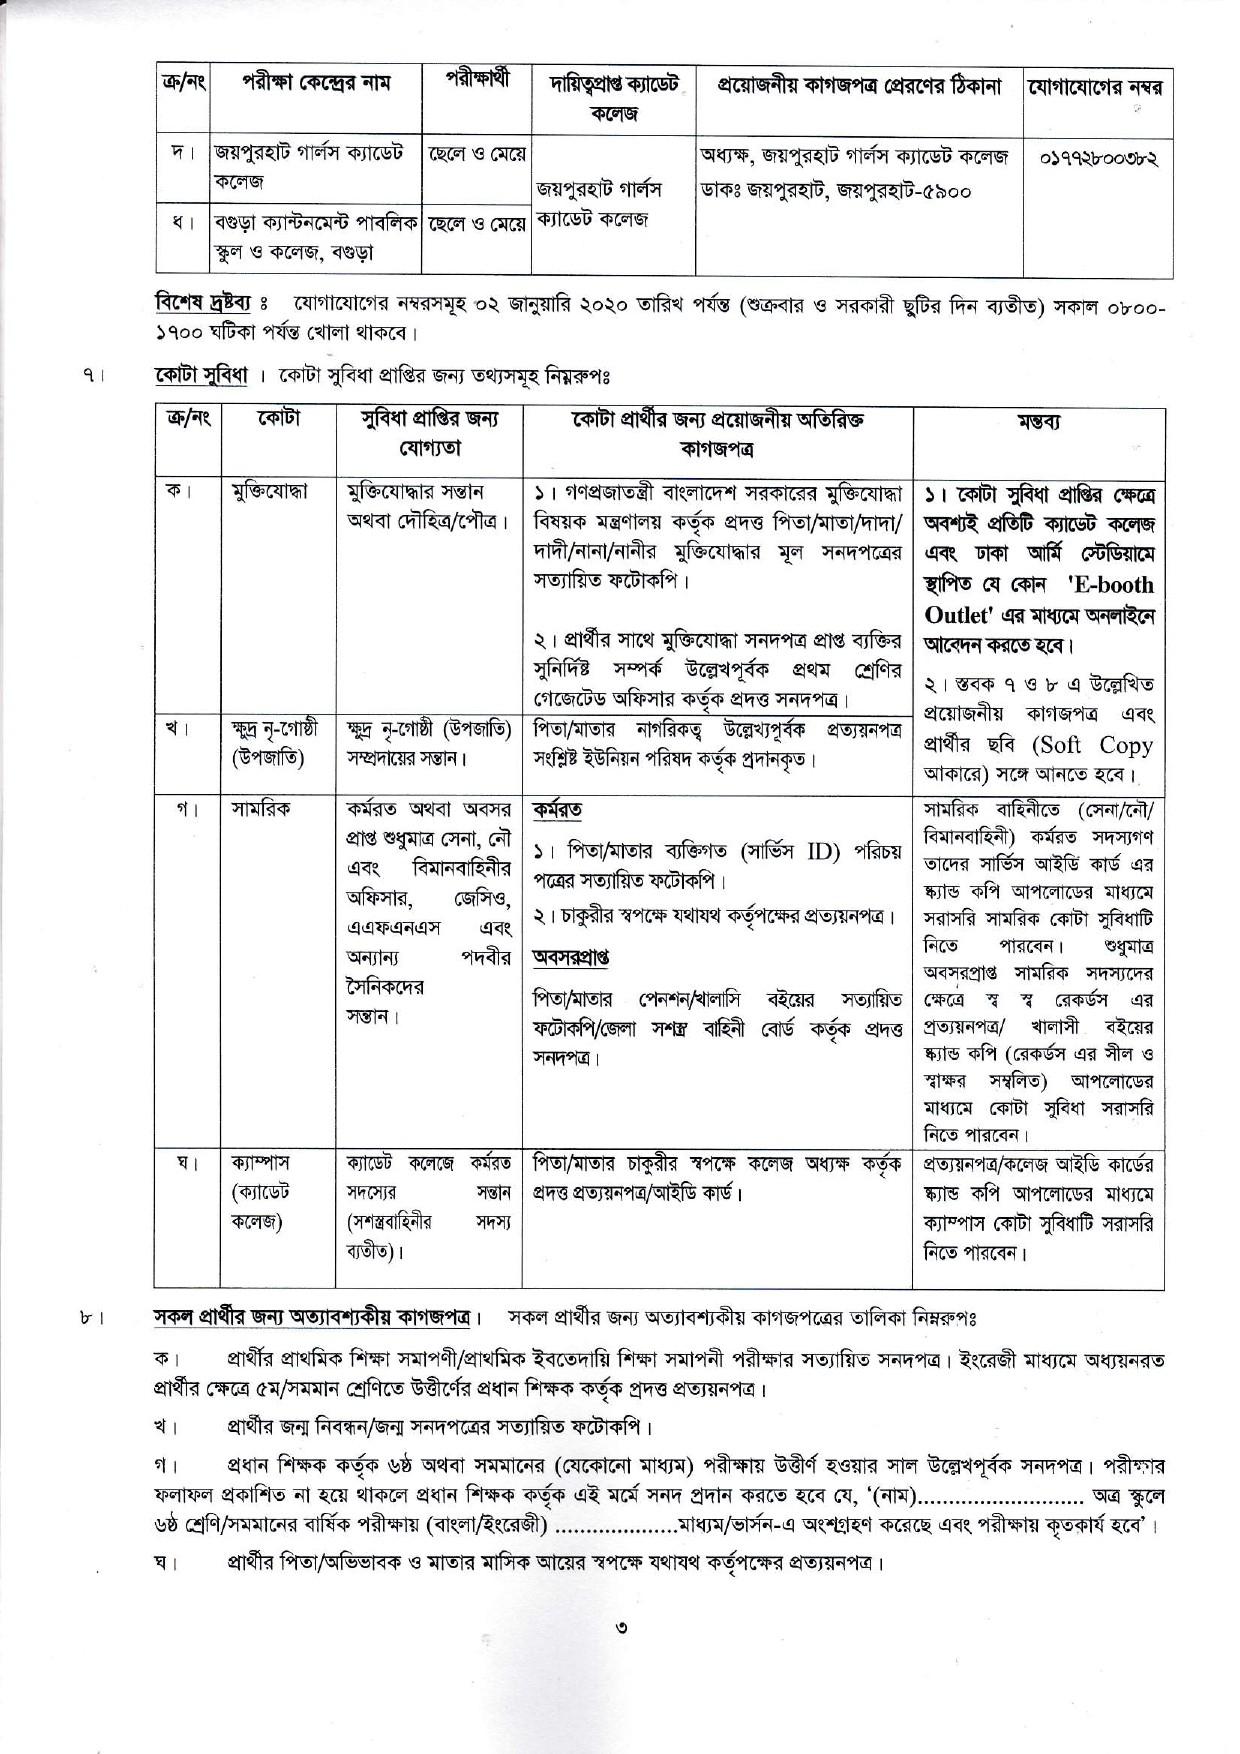 Cadet College Admission Result 2020 - cadetcollege.army.mil.bd result 2020 PDF Download